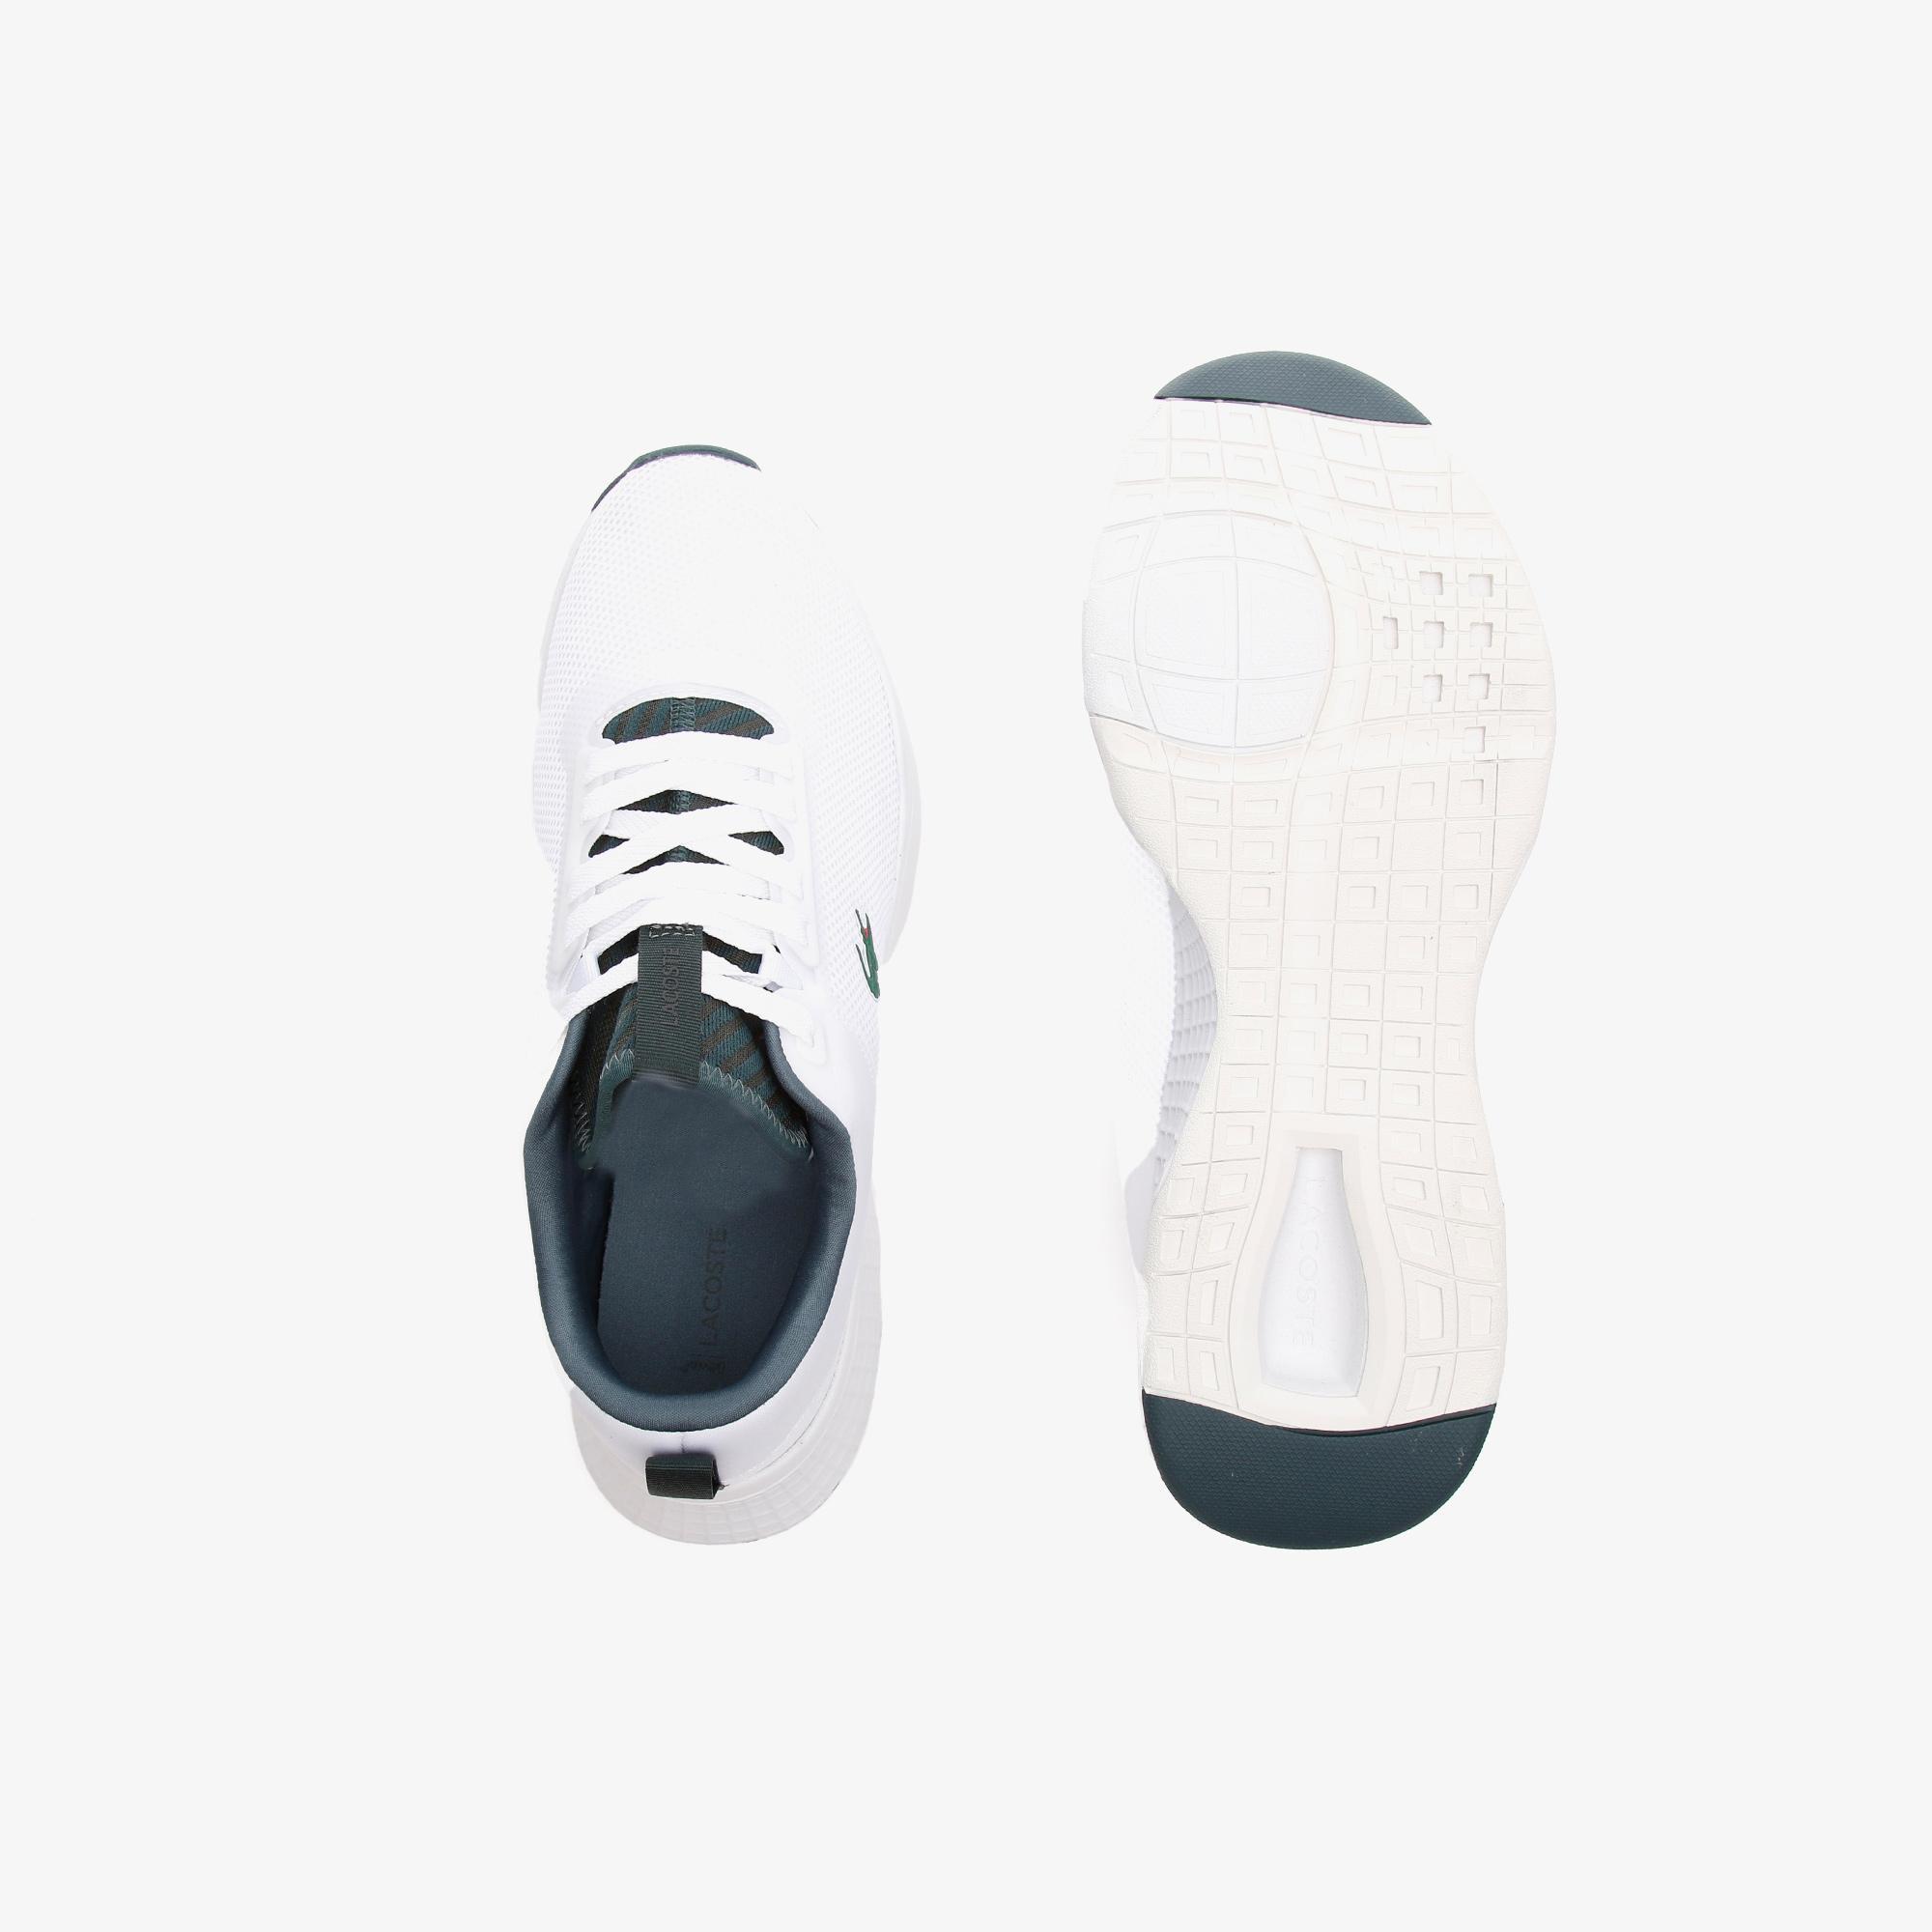 Lacoste Court-Drive 0721 1 Sma Erkek Beyaz - Koyu Yeşil Sneaker